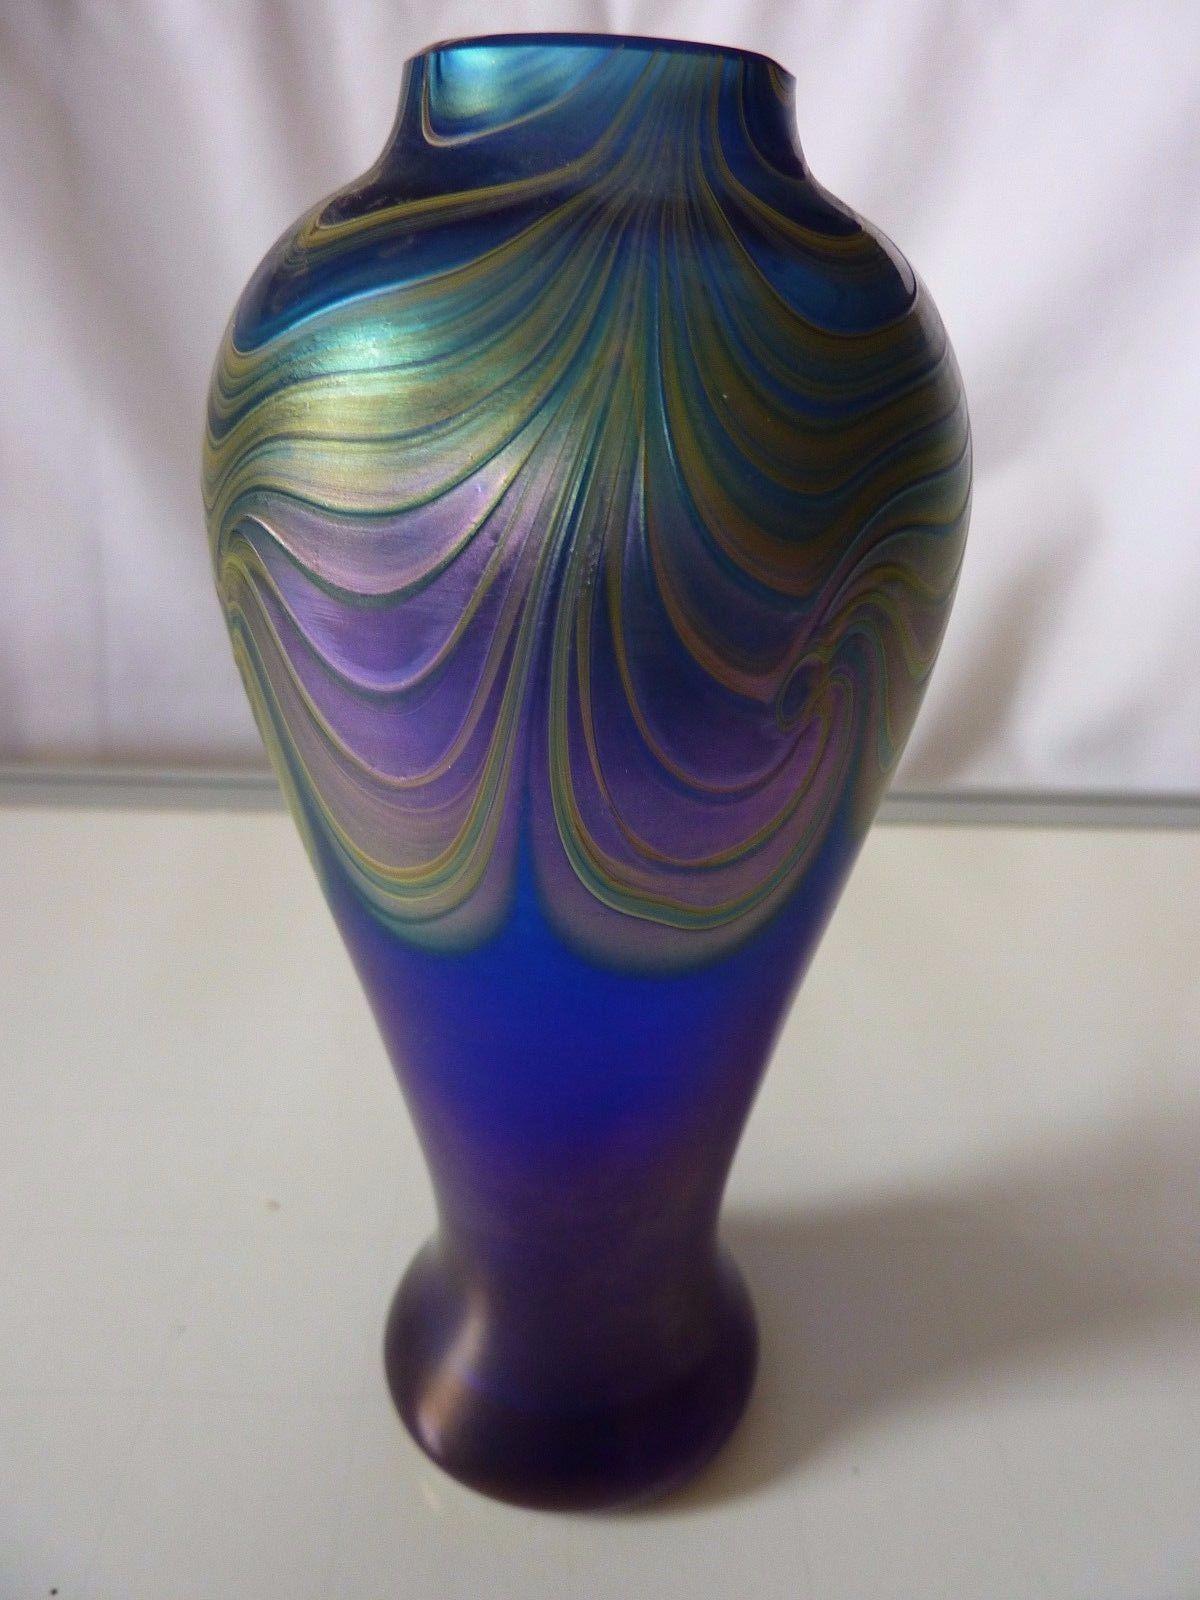 purple ceramic vase of okra glass vase blue and iridescent glassies british okra regarding okra glass vase blue and iridescent ebay